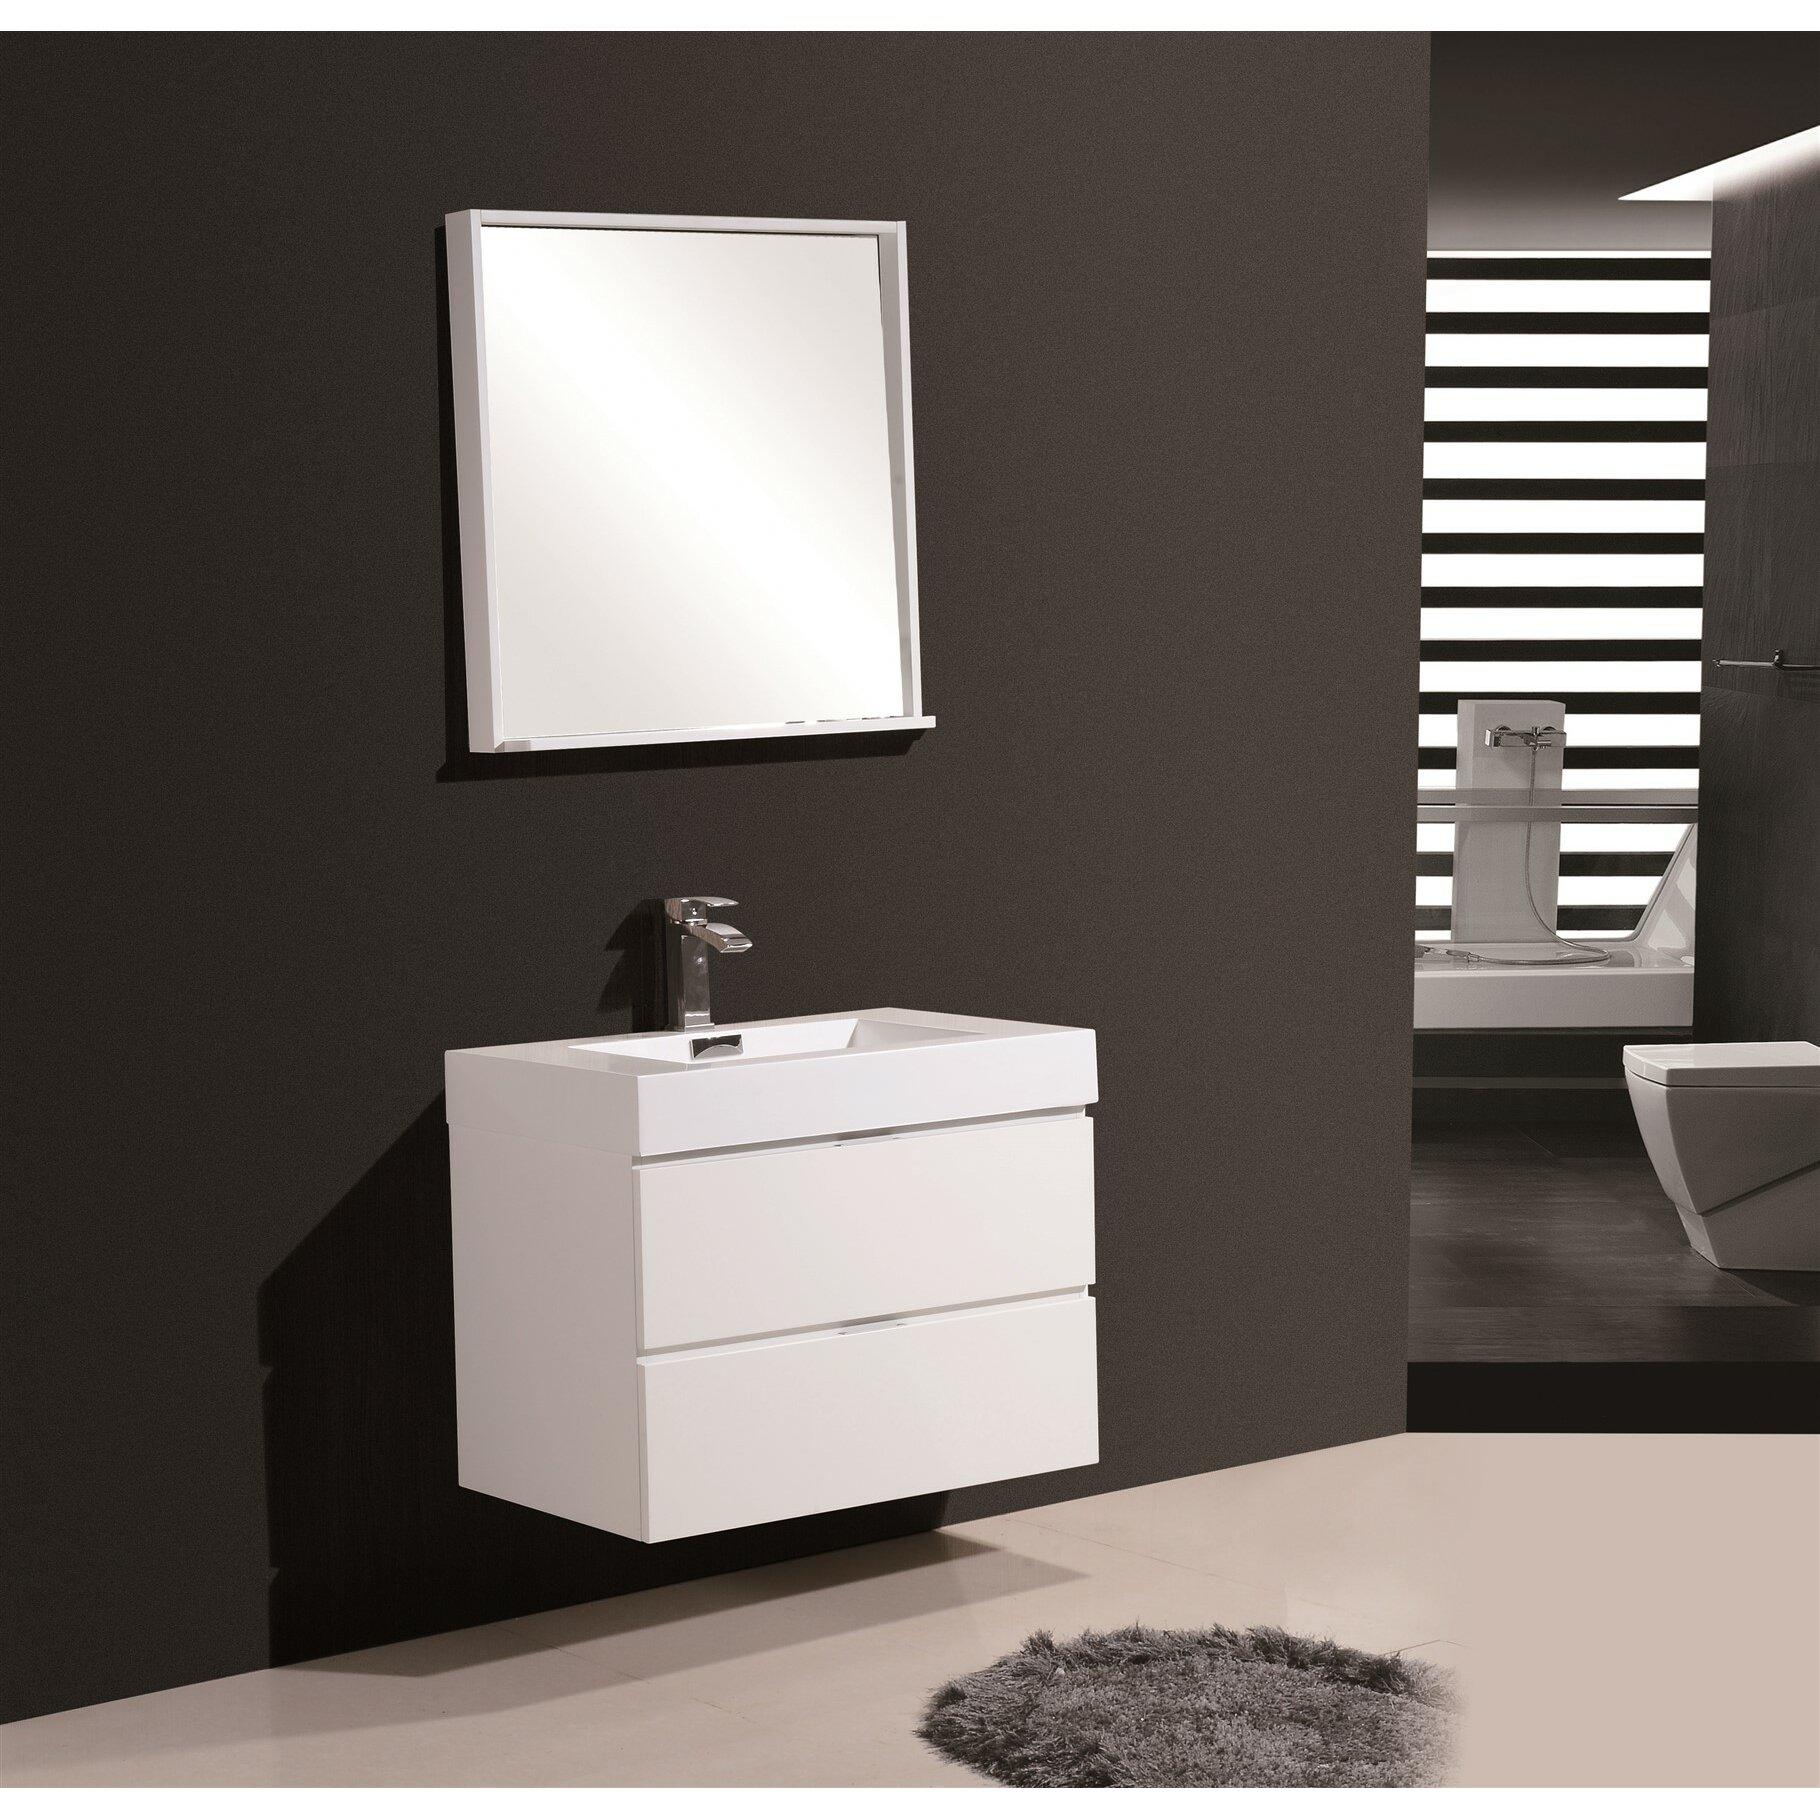 Kube bath bliss 30 single wall mount modern bathroom for Wayfair bathroom wallpaper